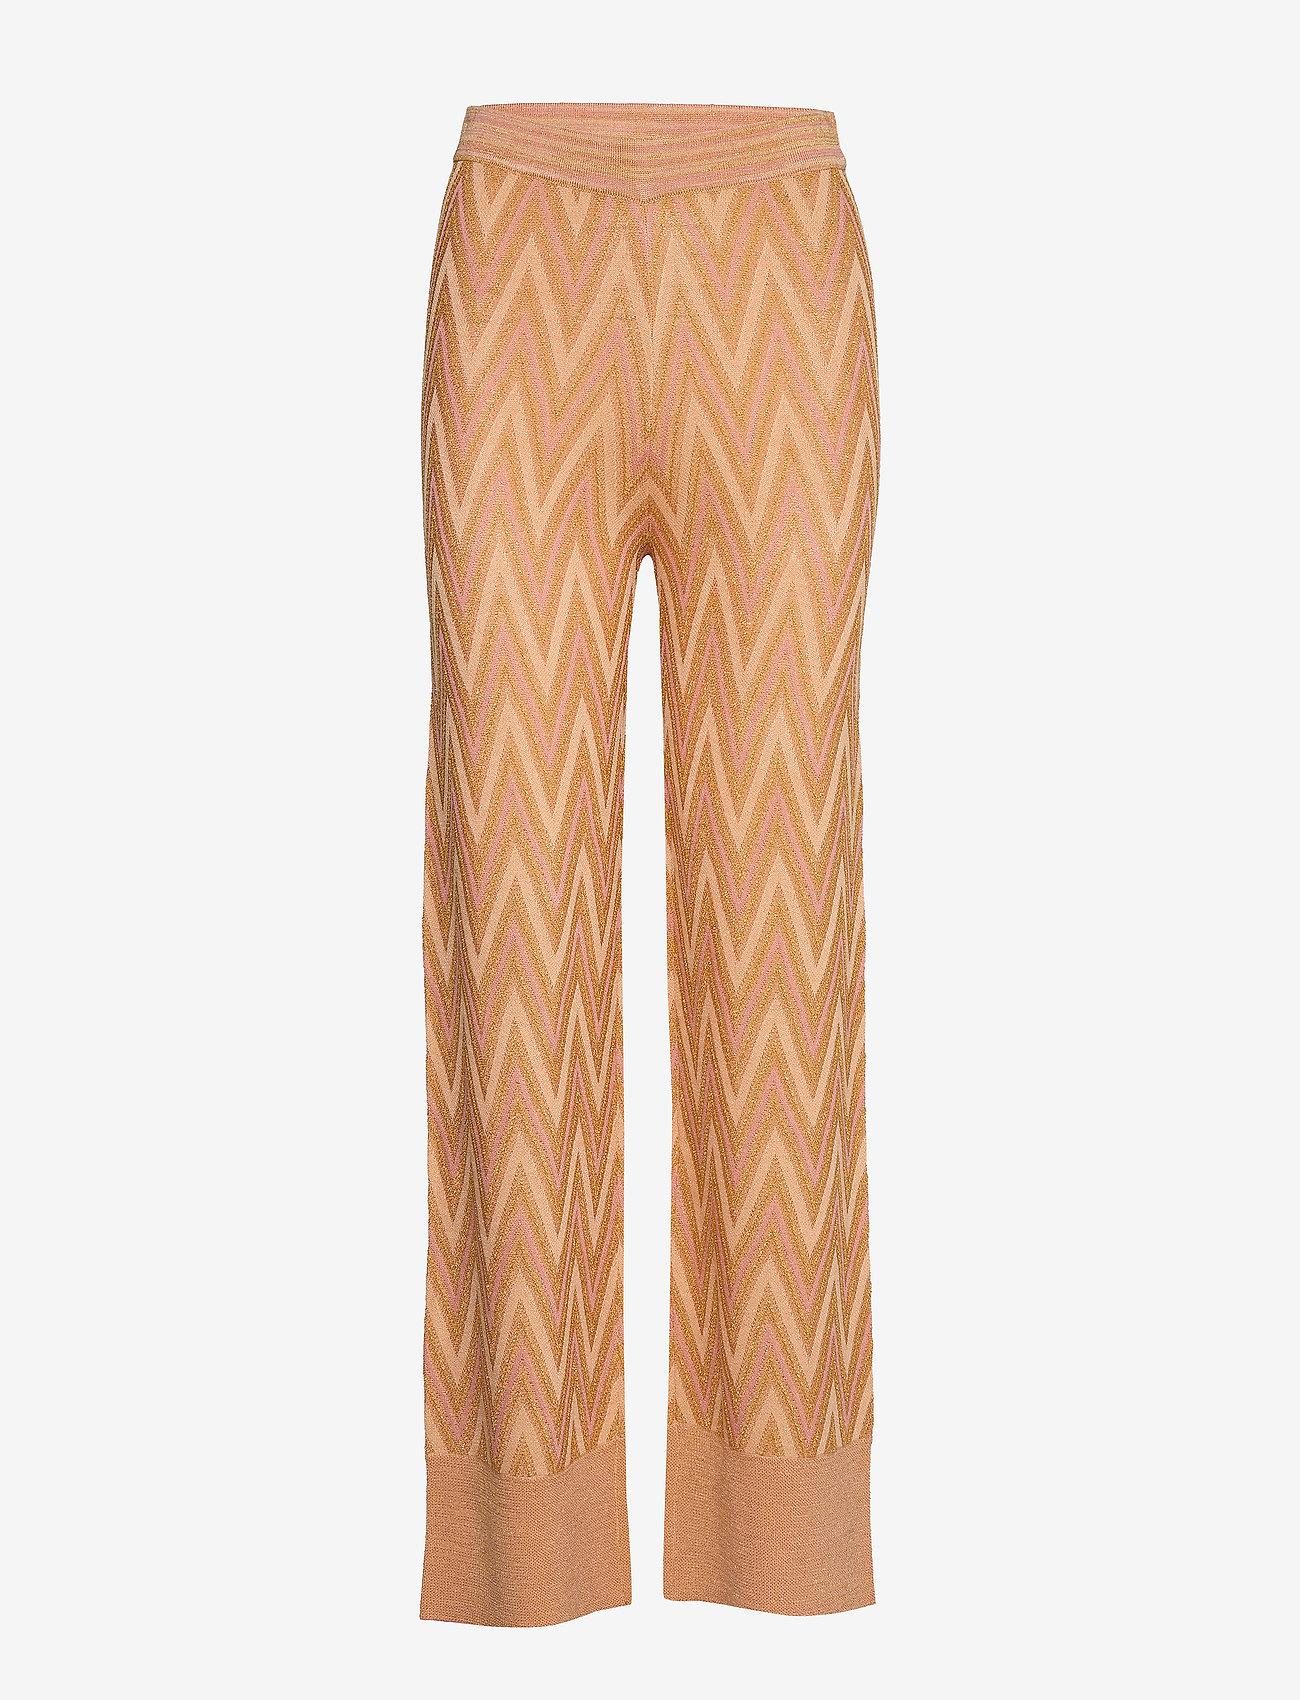 Bea Knit New Trousers (Desert Mist) - Second Female KxJGy2